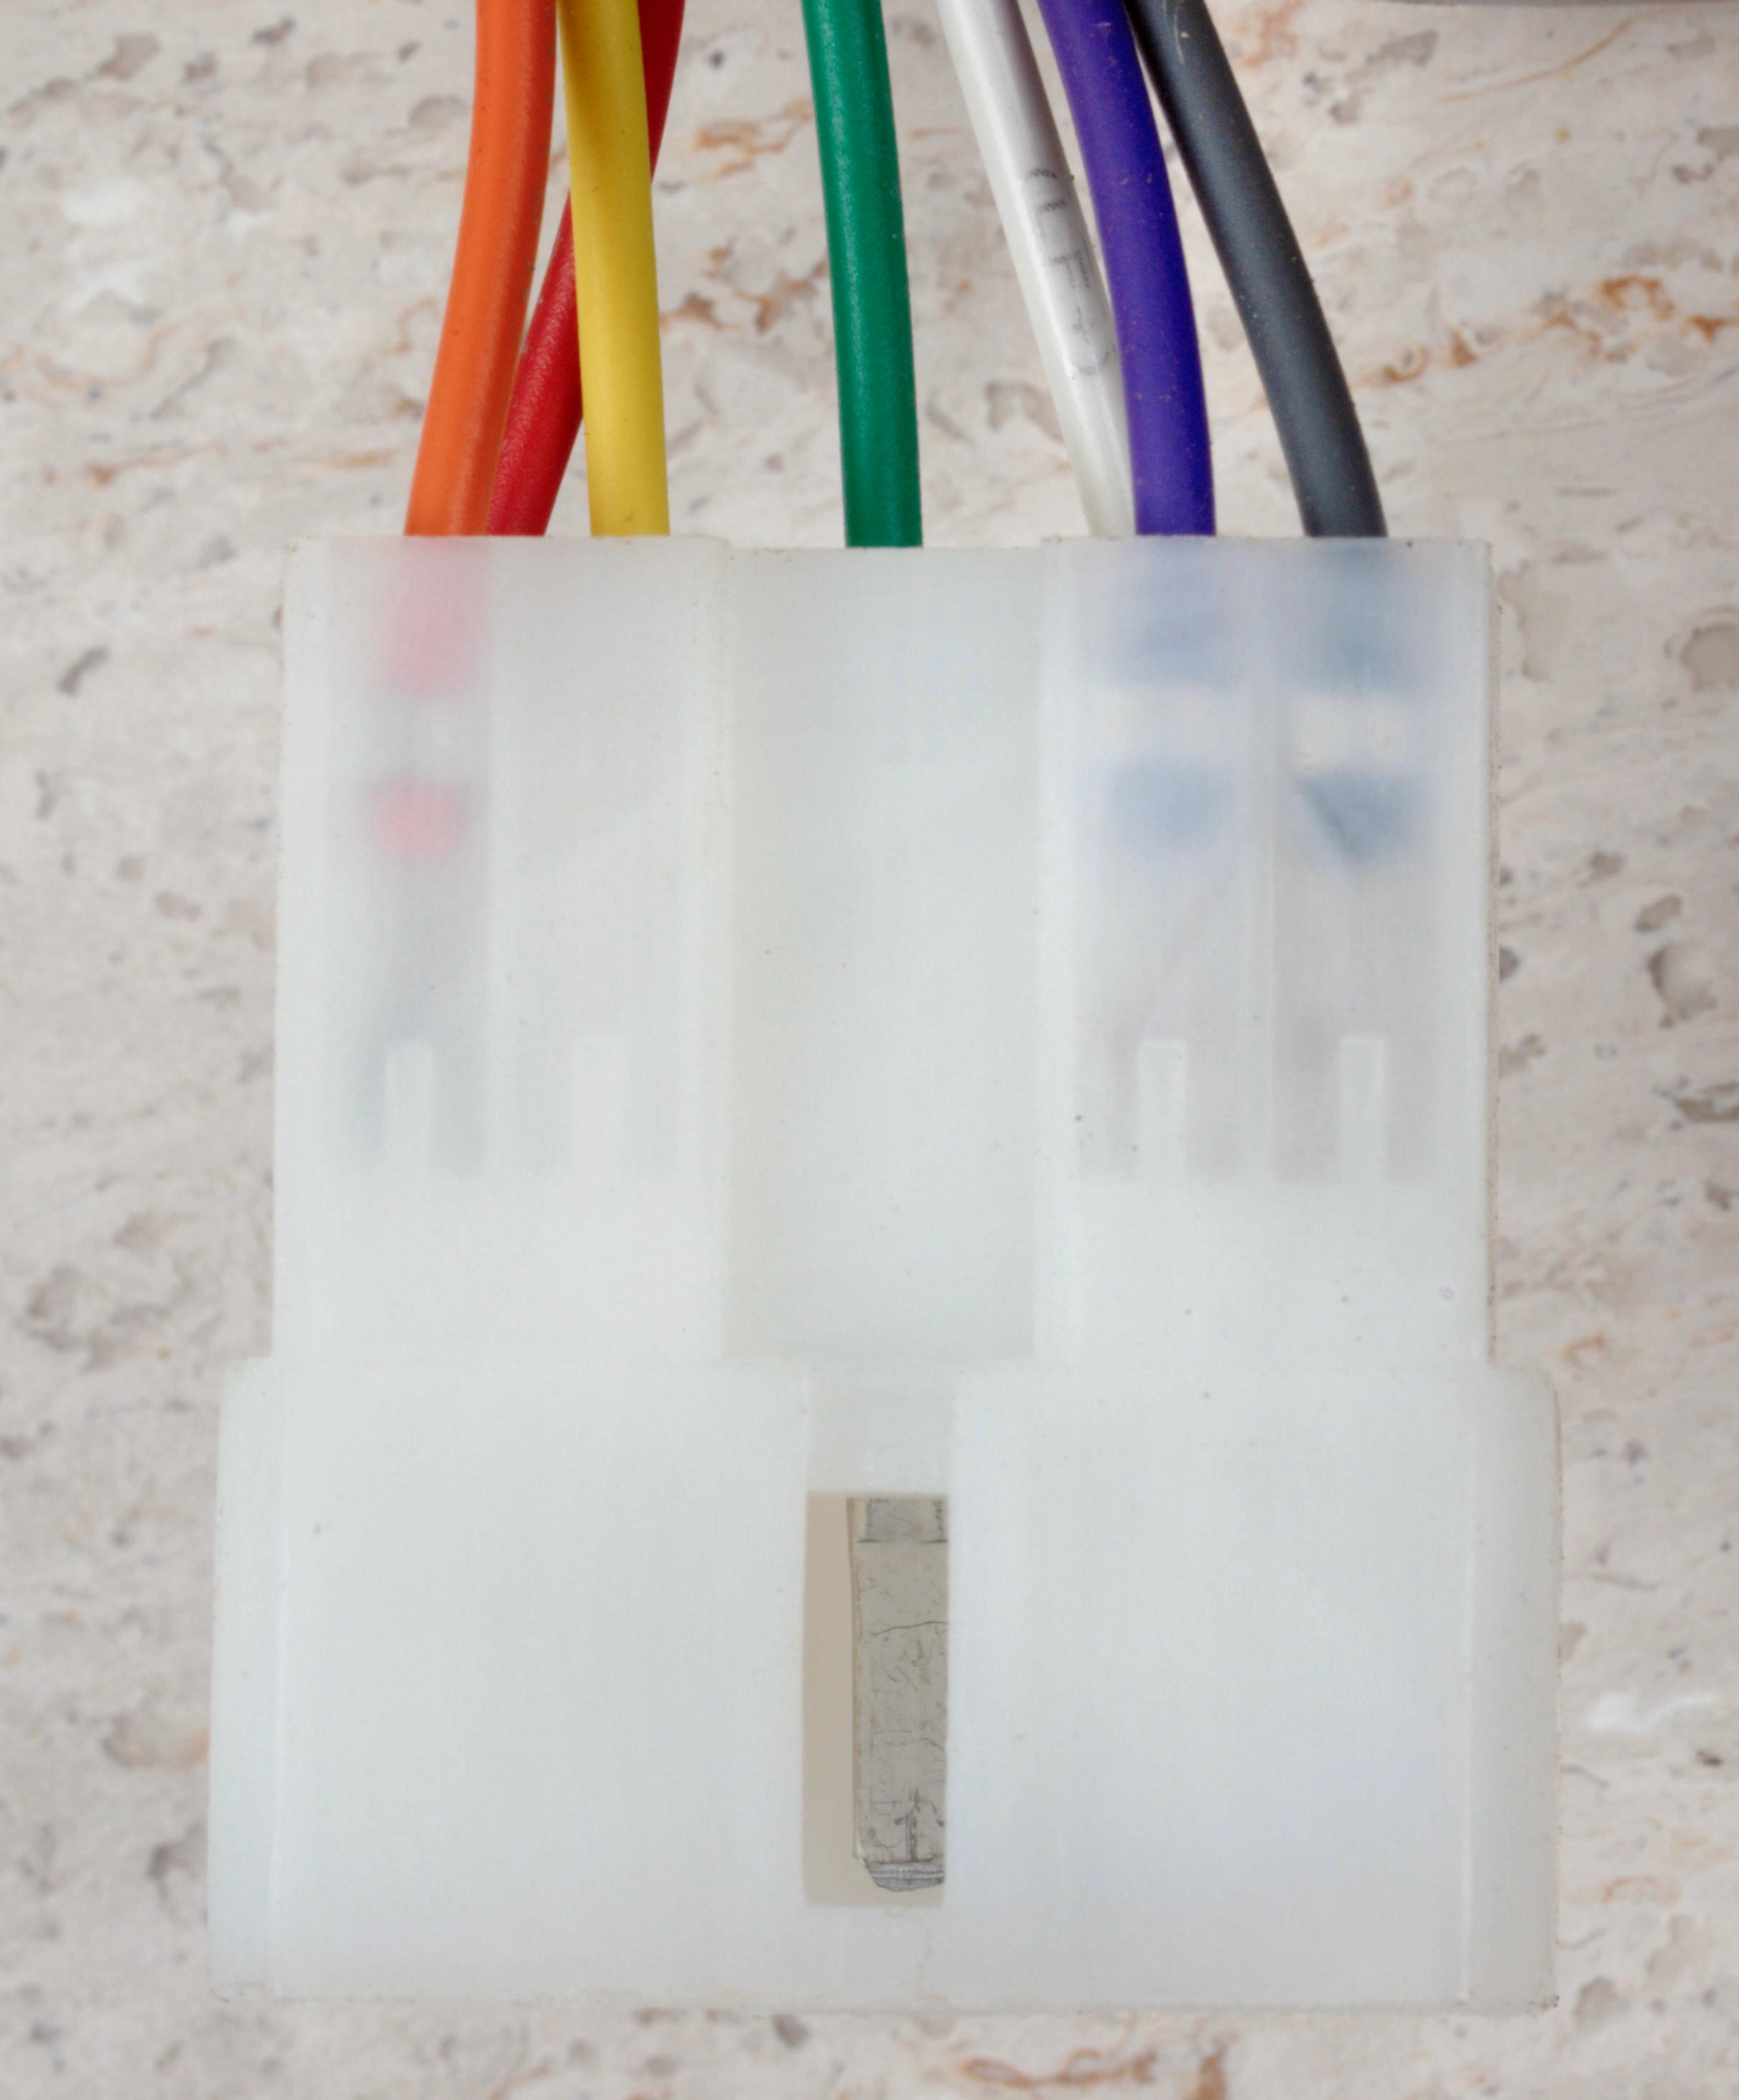 Car-connector-1-cables.jpeg